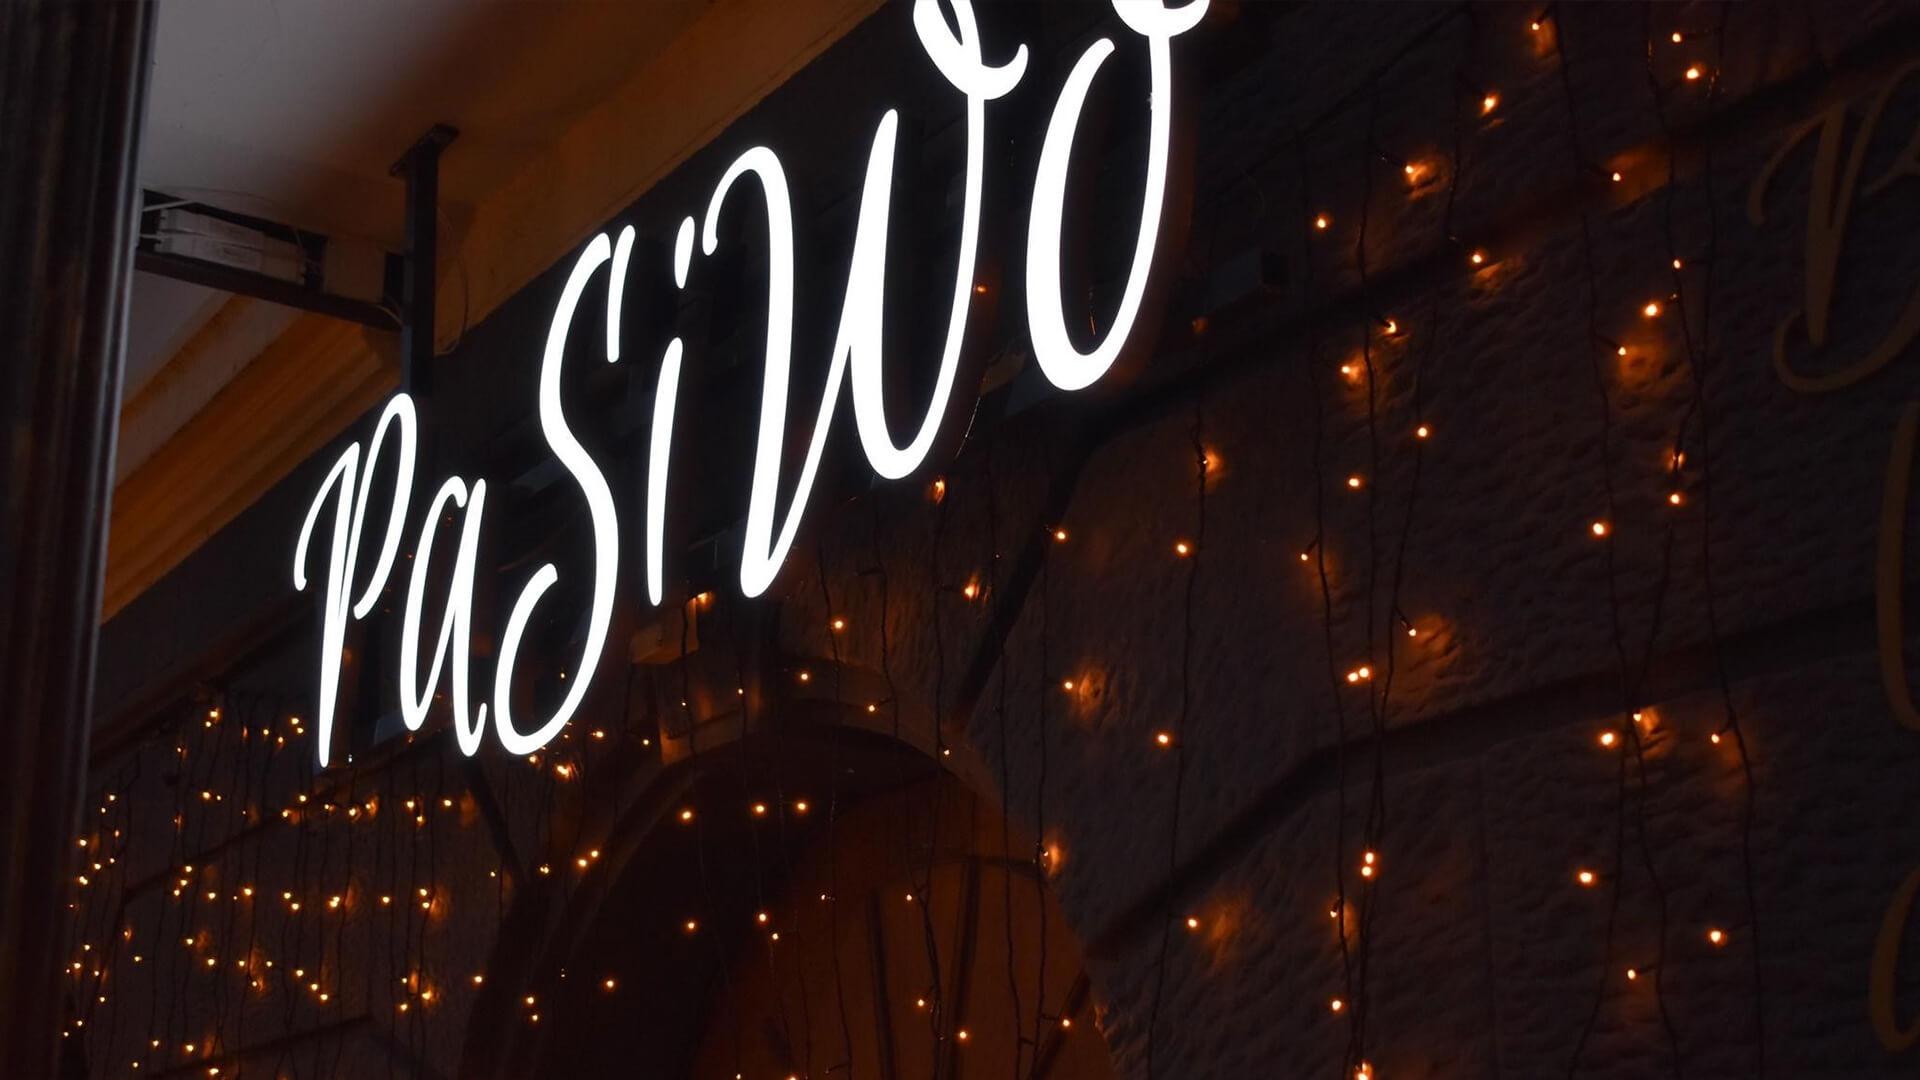 PaSiWo Home Leuchtlogo